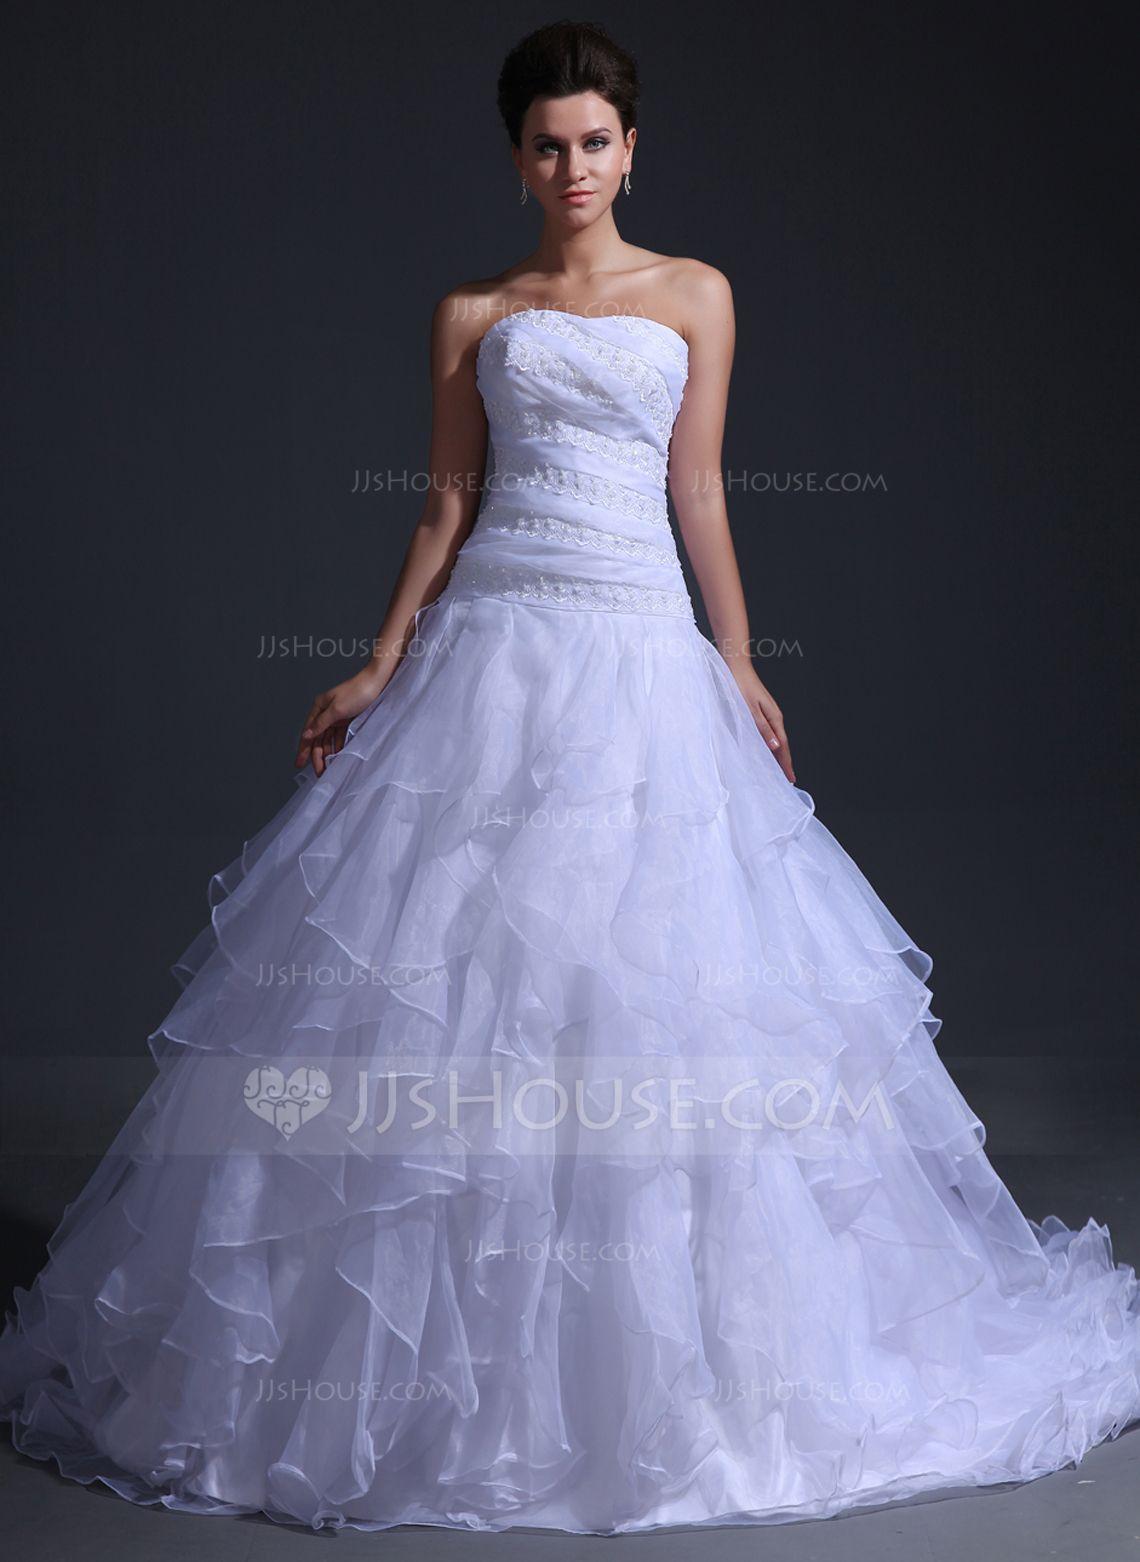 BallGown Sweetheart Cathedral Train Organza Wedding Dress